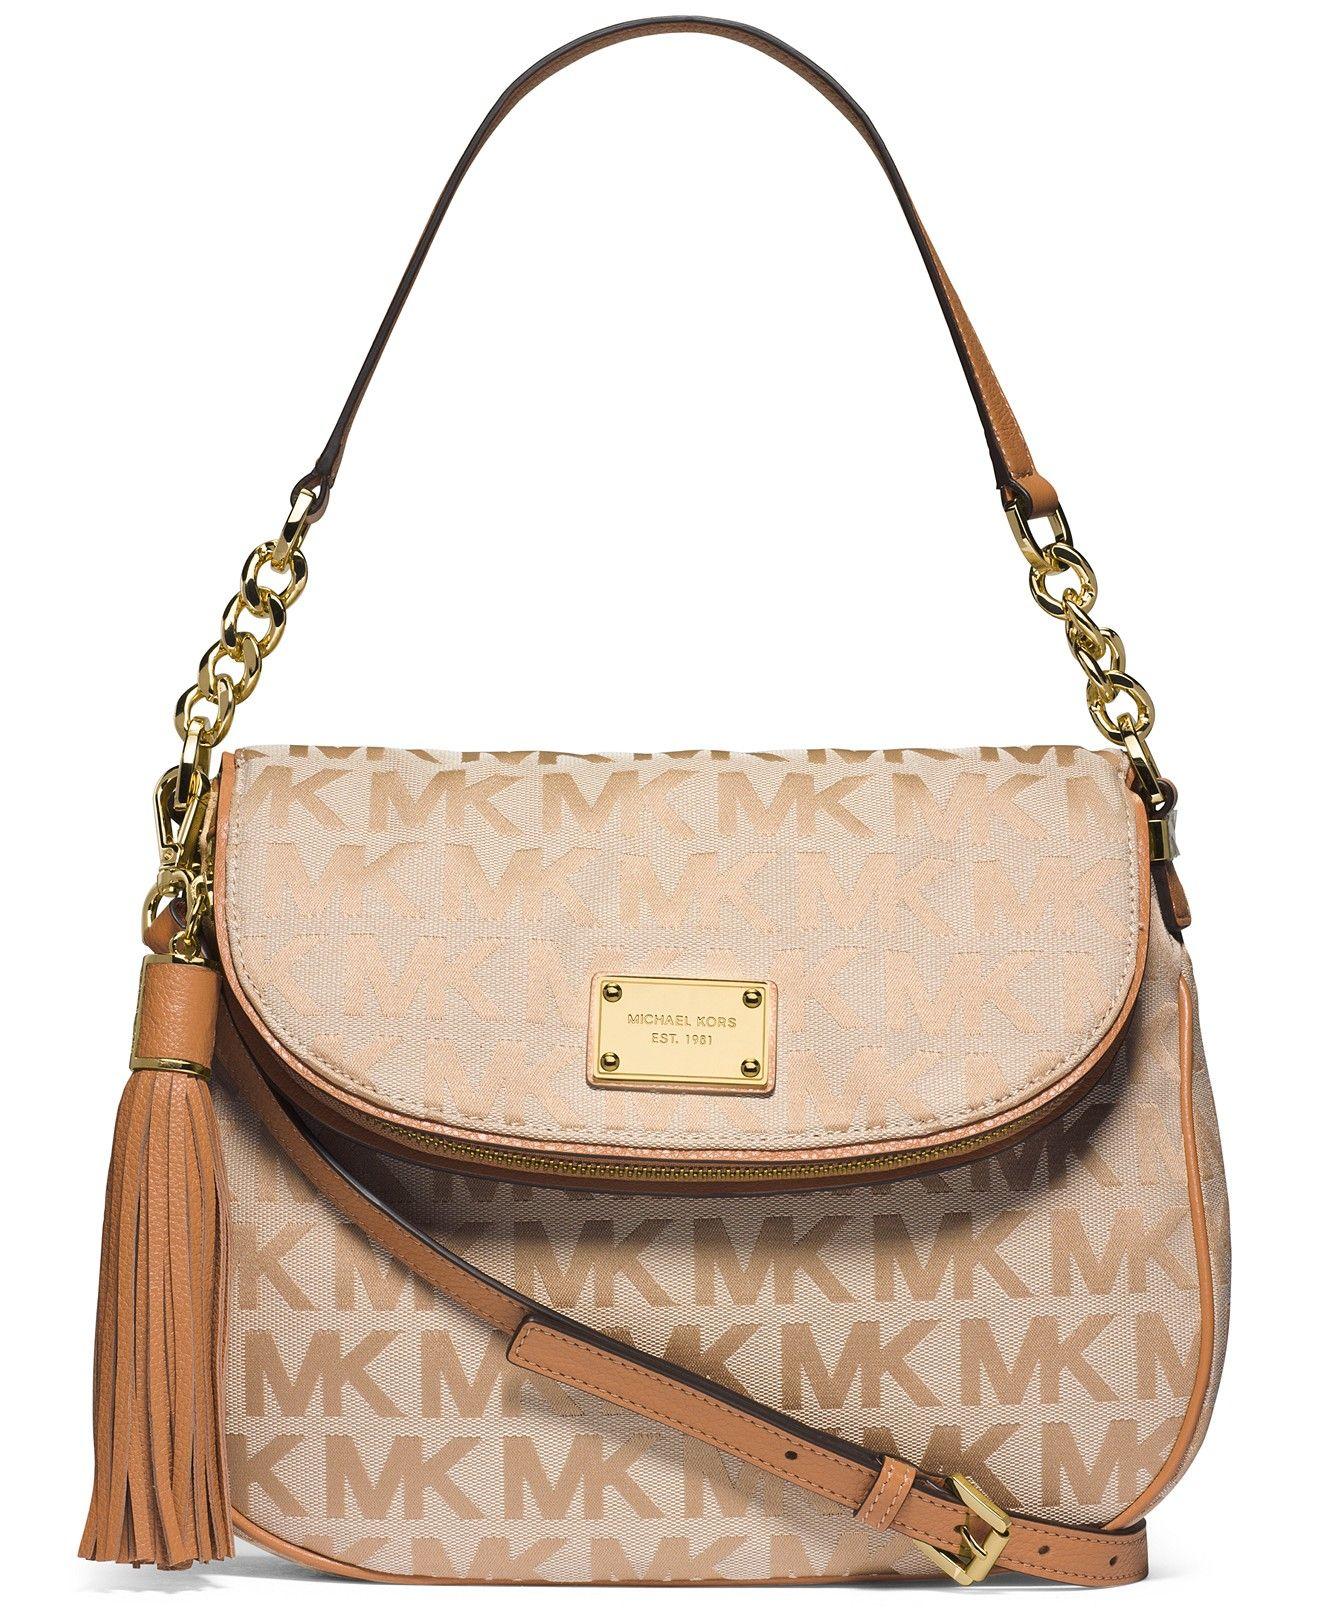 Michael Kors Jet Set Item Medium Tassel Convertible Shoulder Clearance Handbags Accessories Macy S